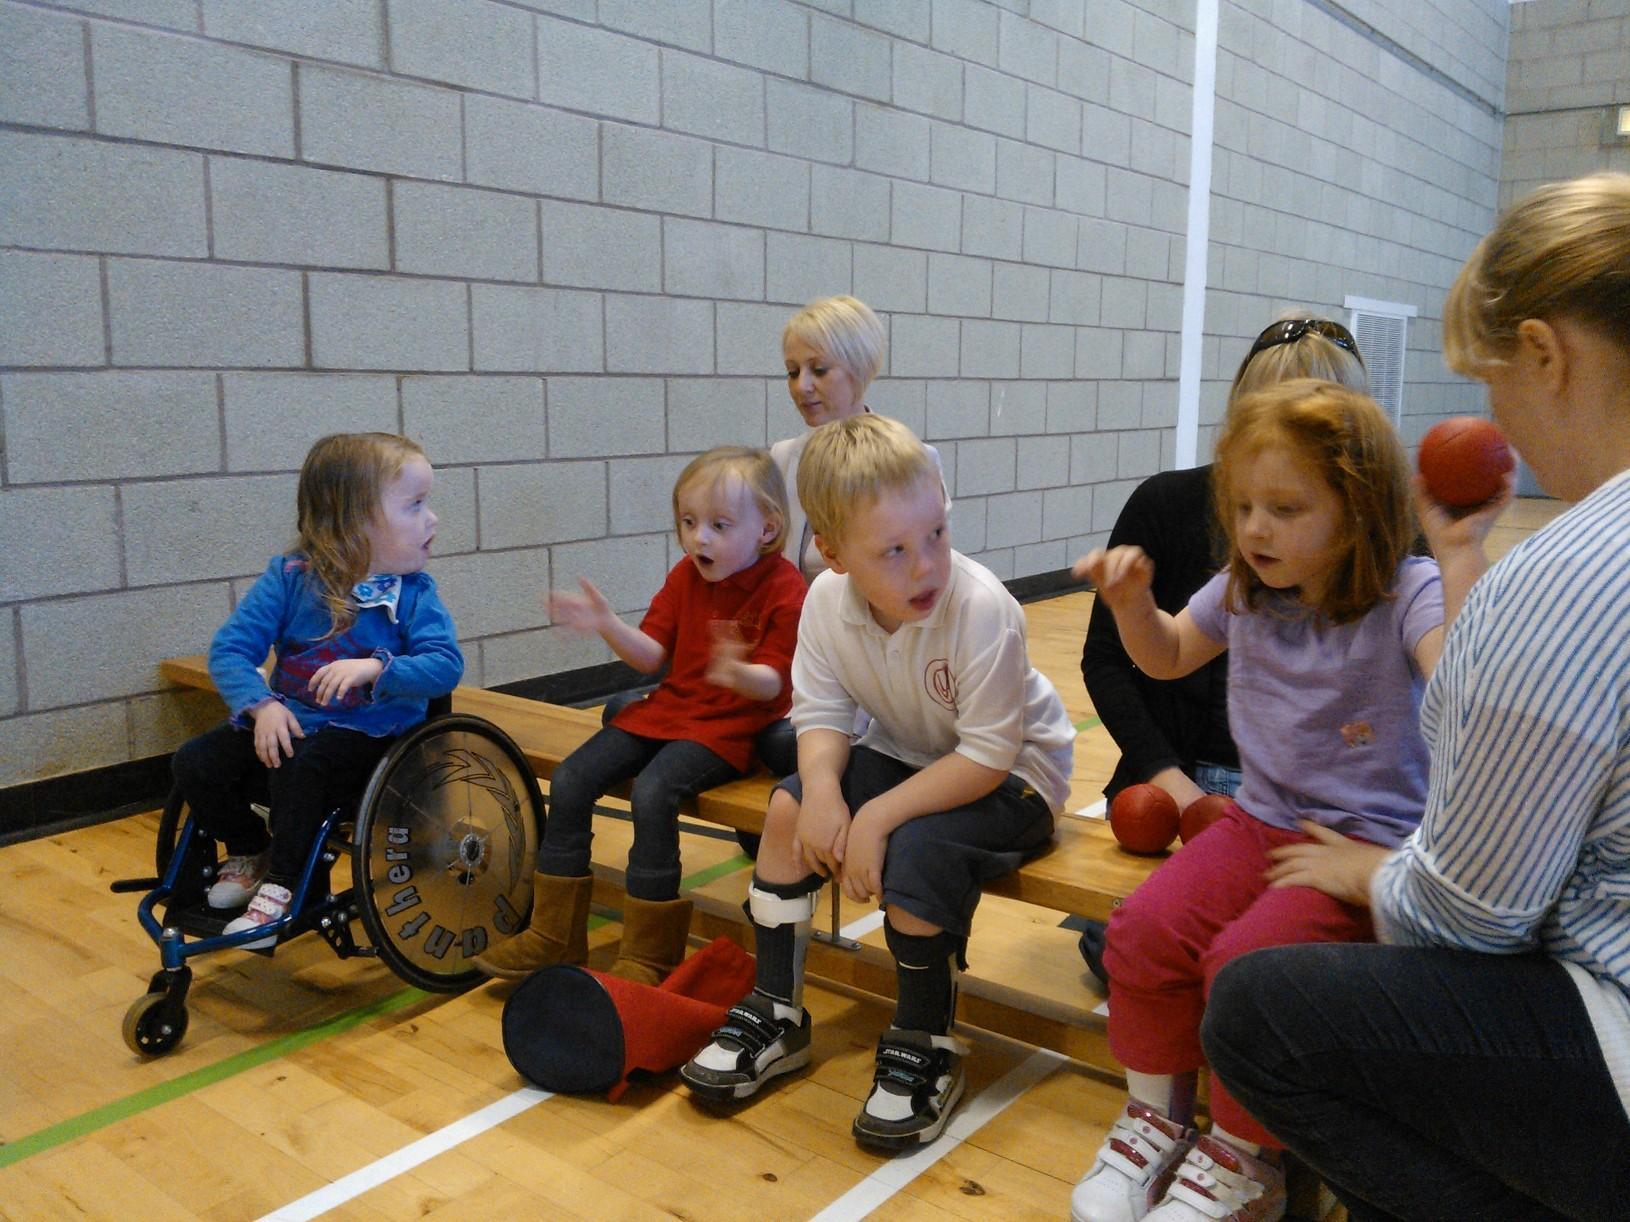 Children in sports club